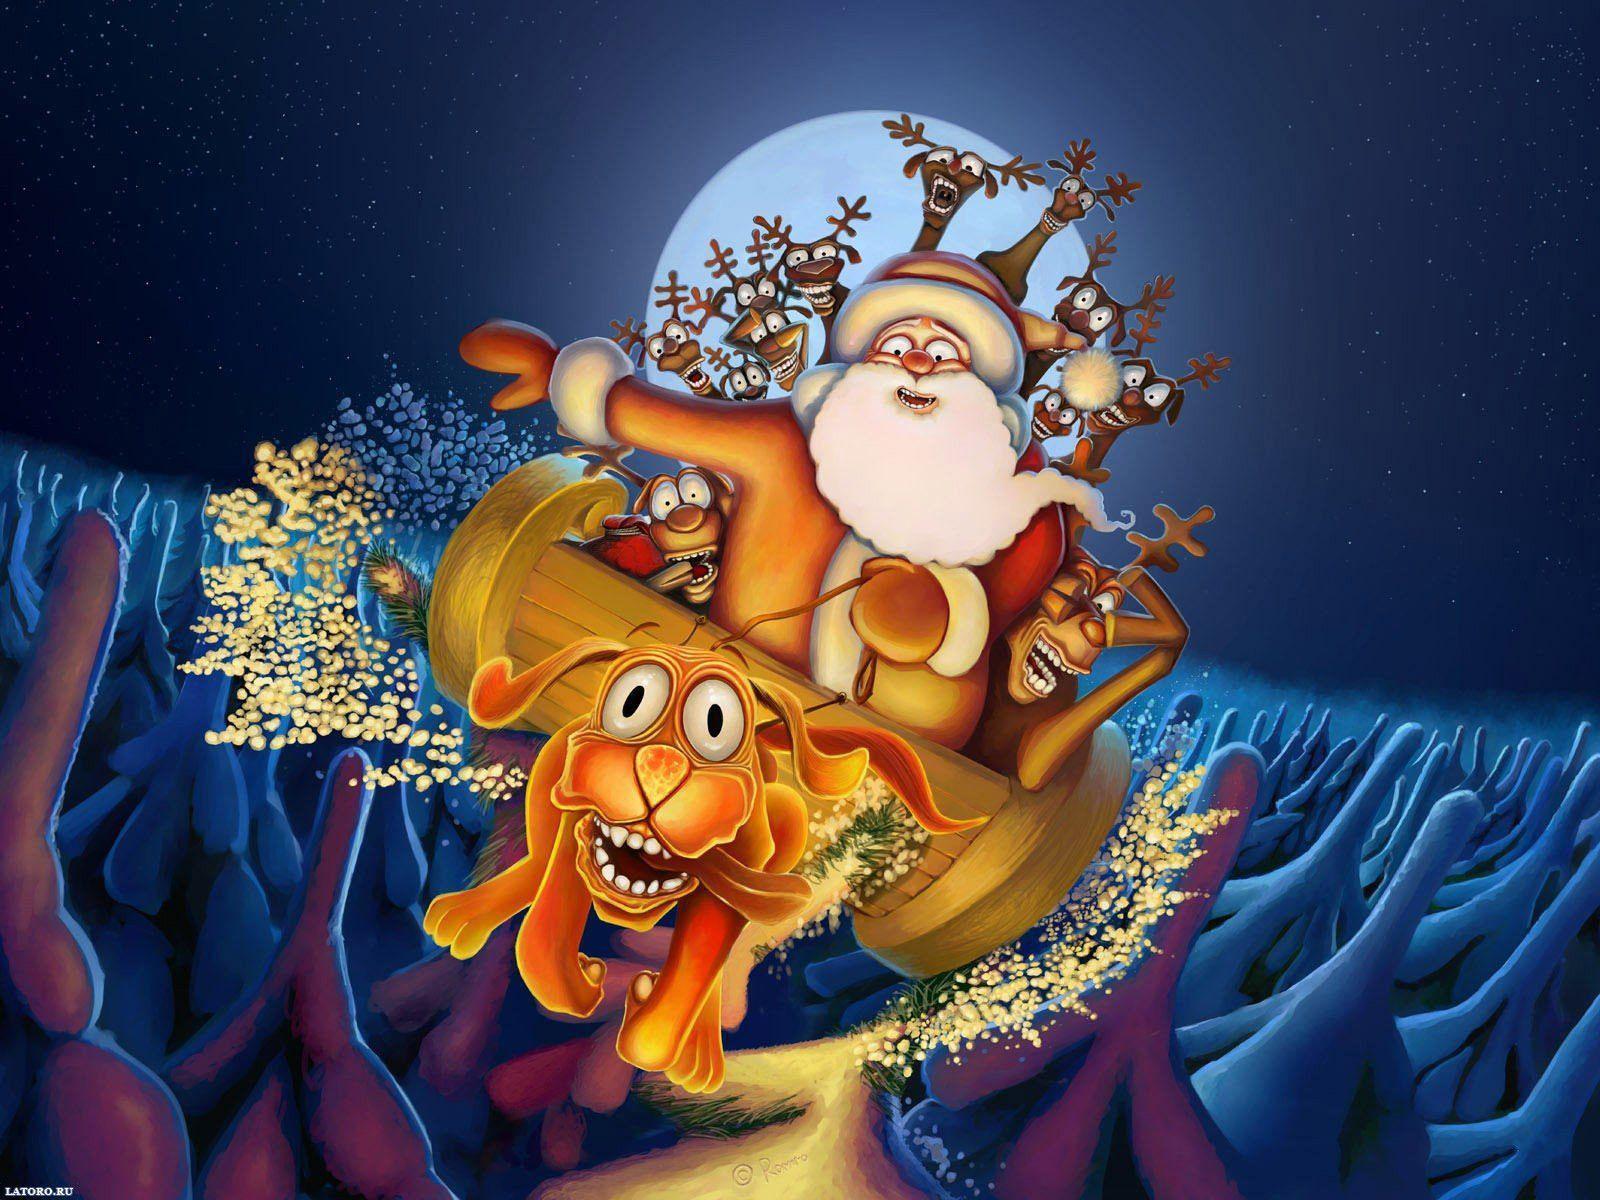 [Resim: santa-reindeer-widesclajjg.jpg]